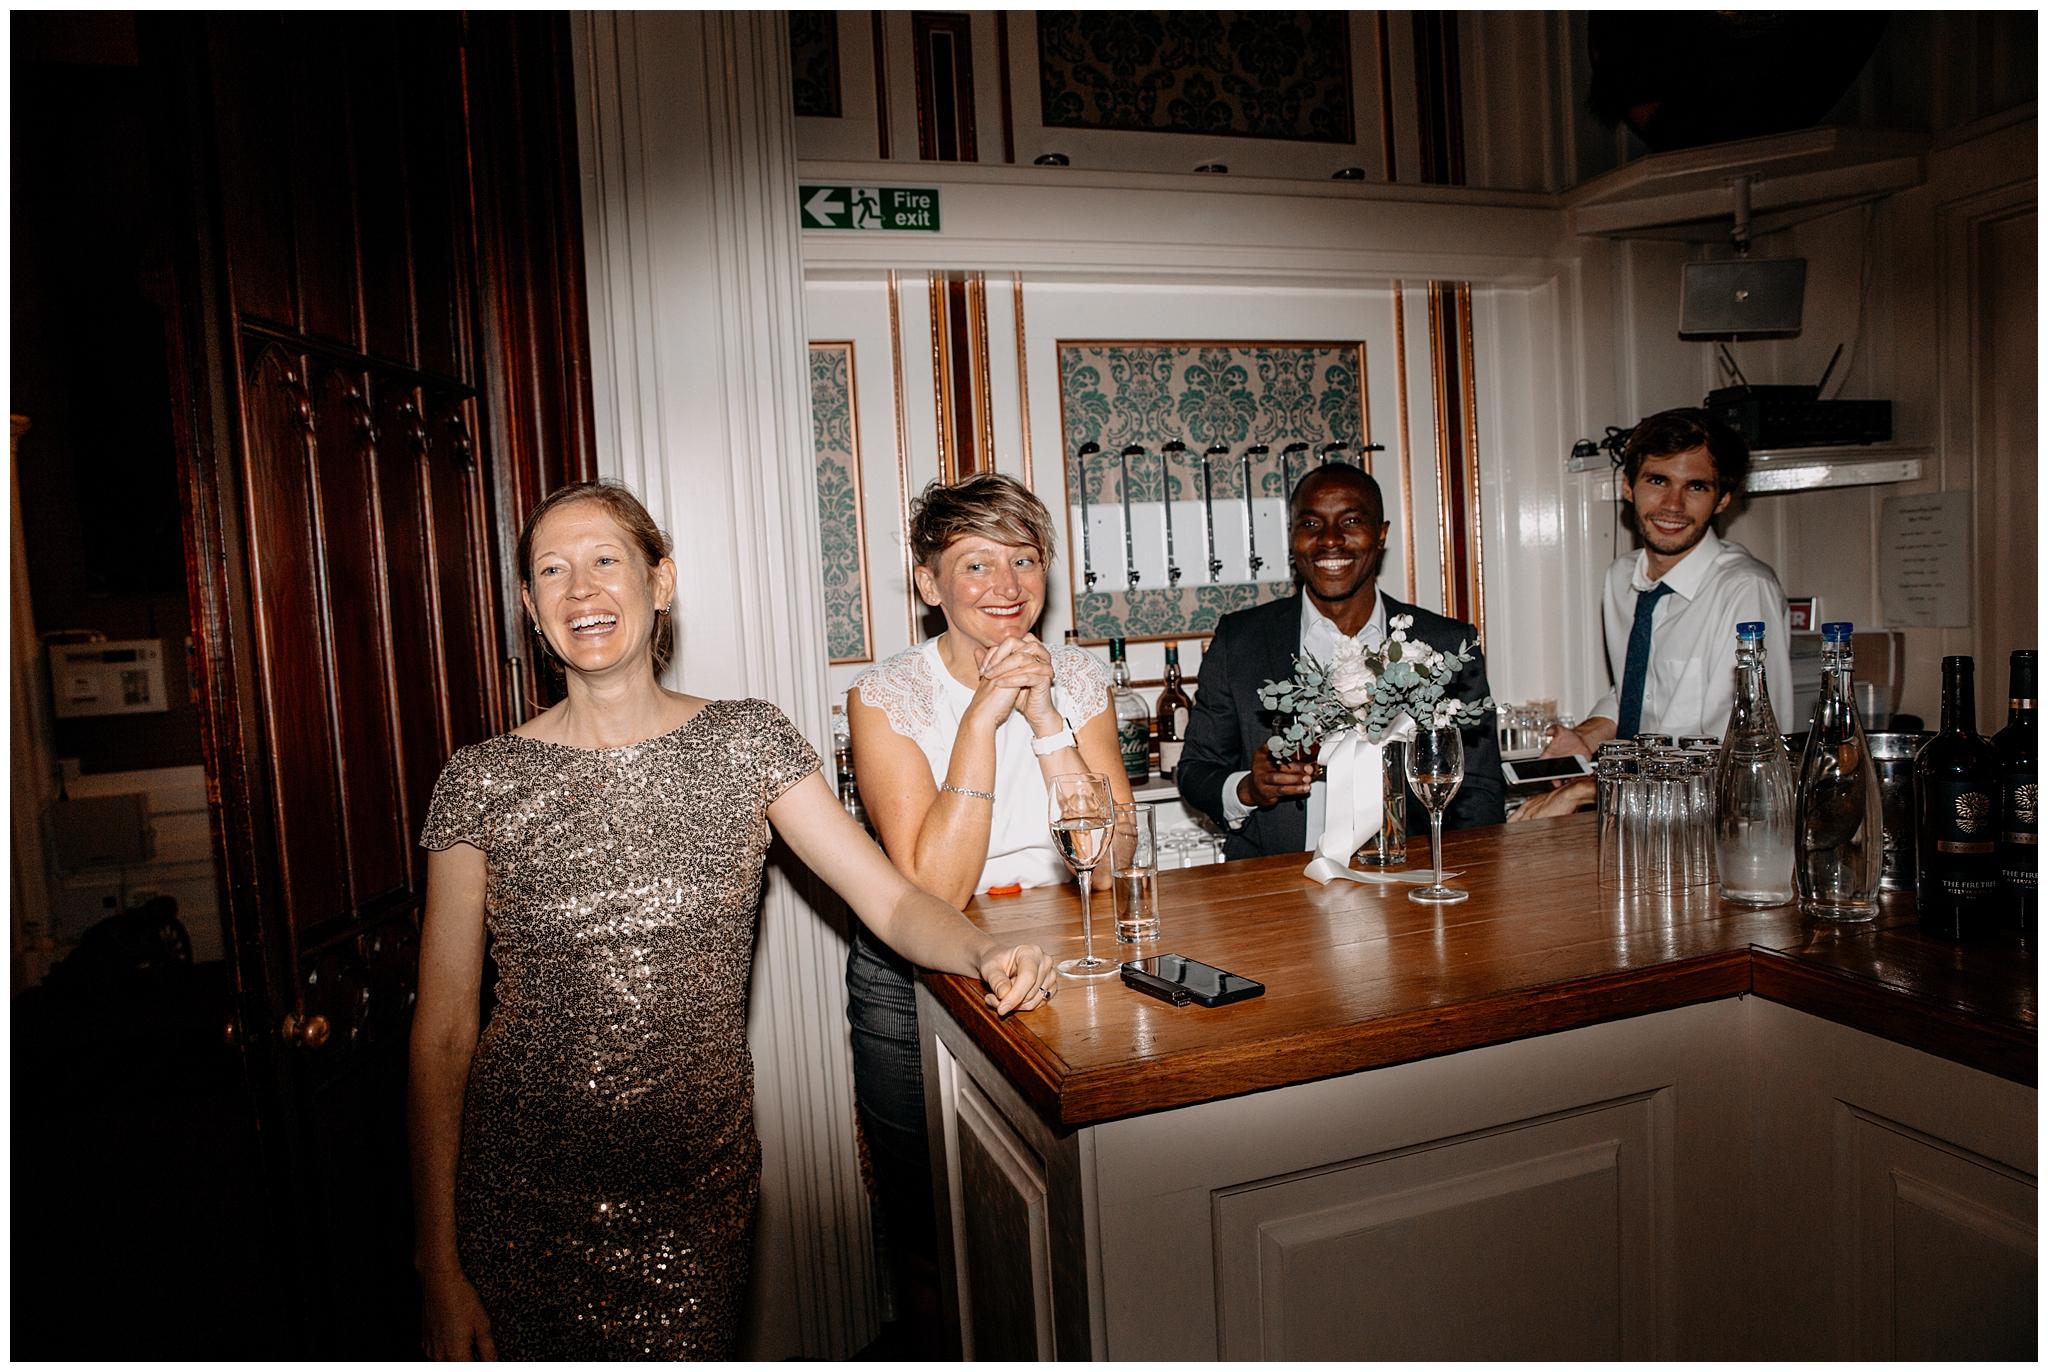 austin-texas-scottish-wedding-bride-groom22030.JPG